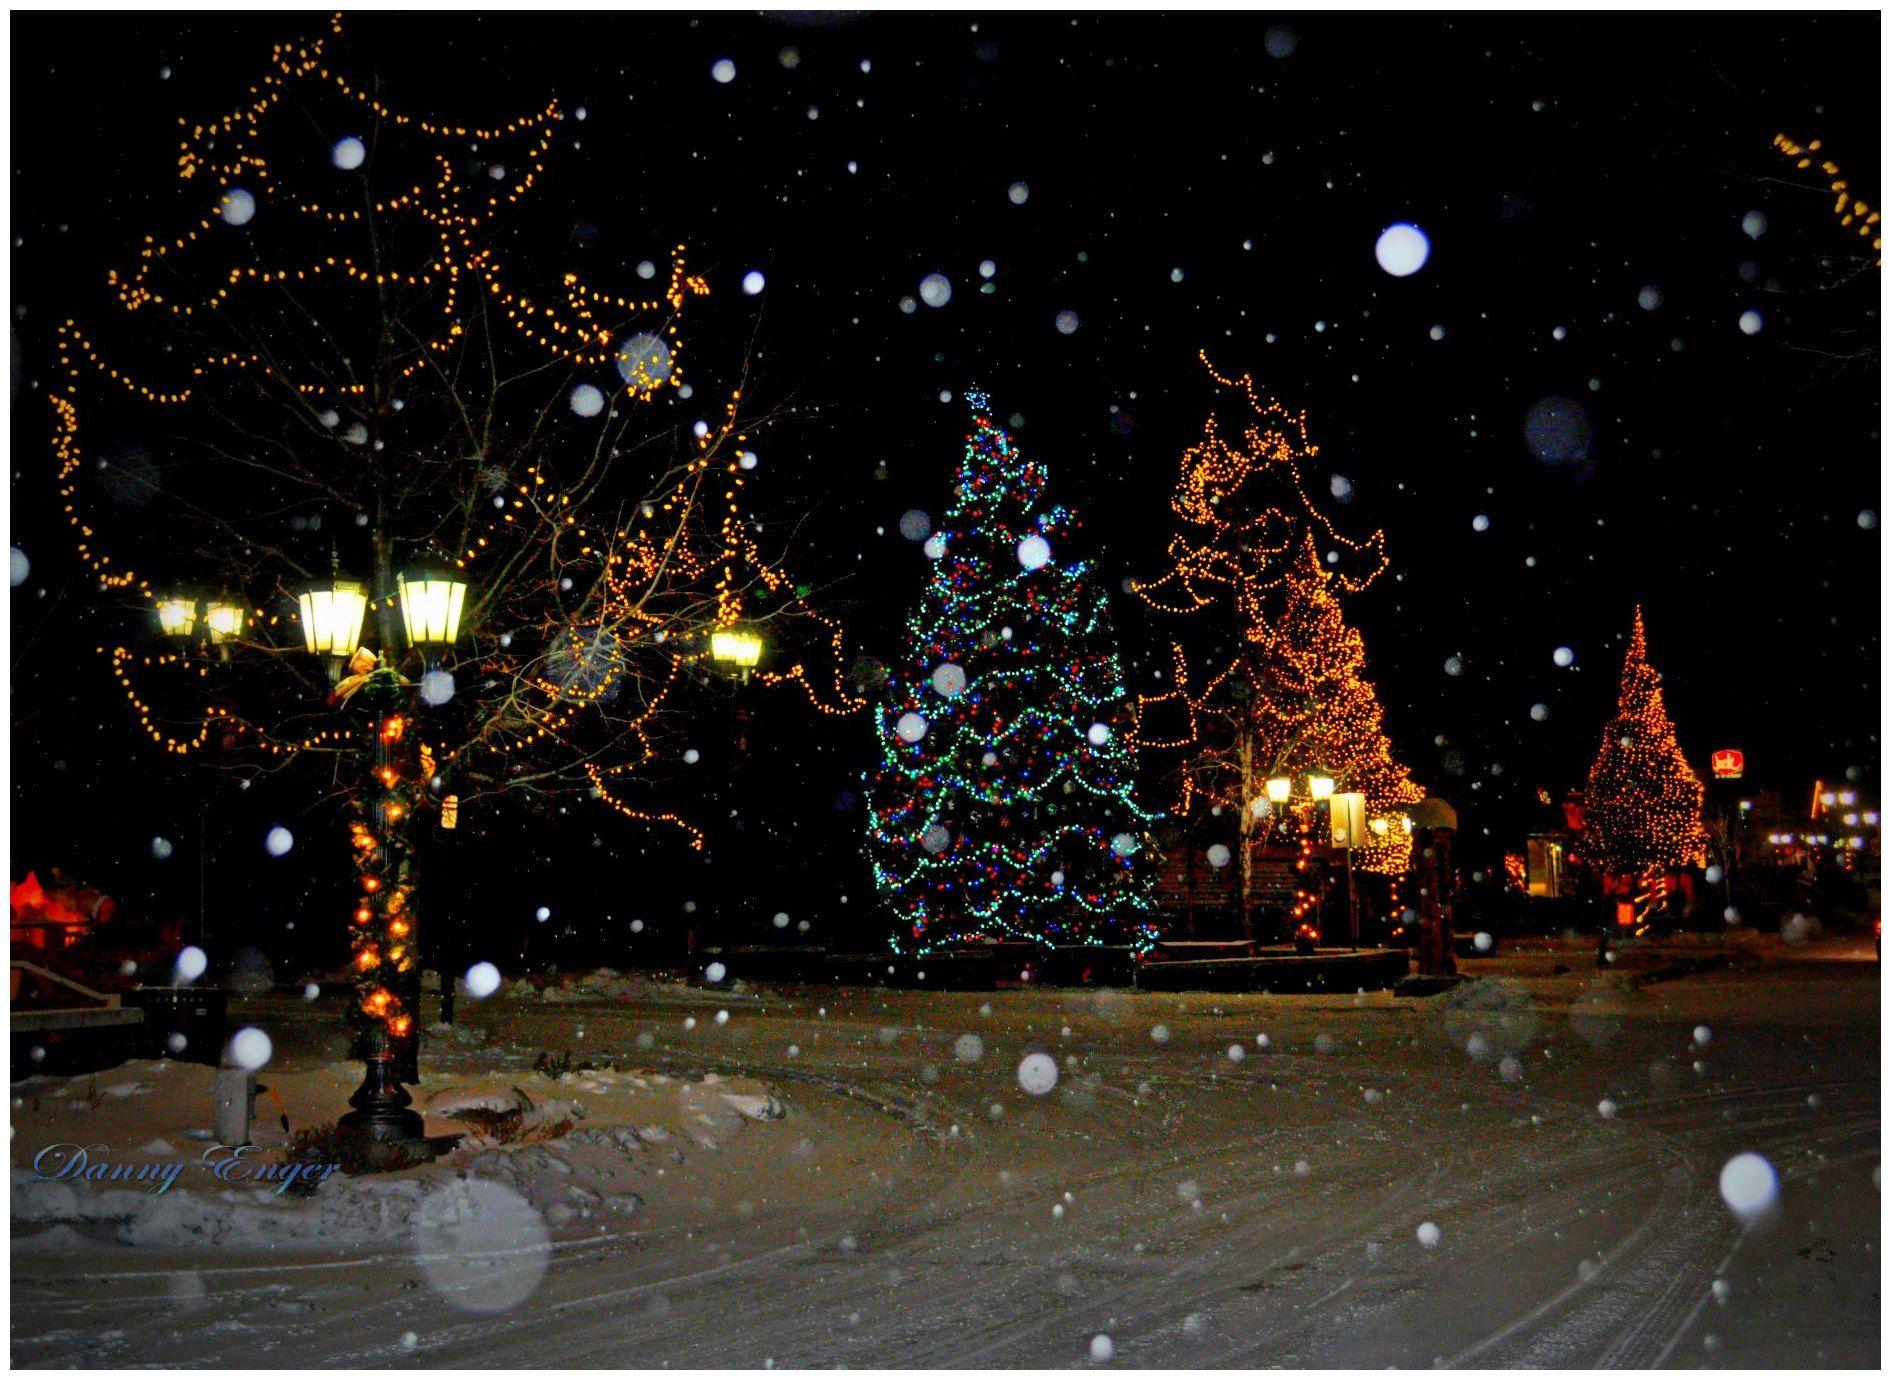 Big Bear Christmas.Big Bear Lake Ca Christmas Time In The Village Village